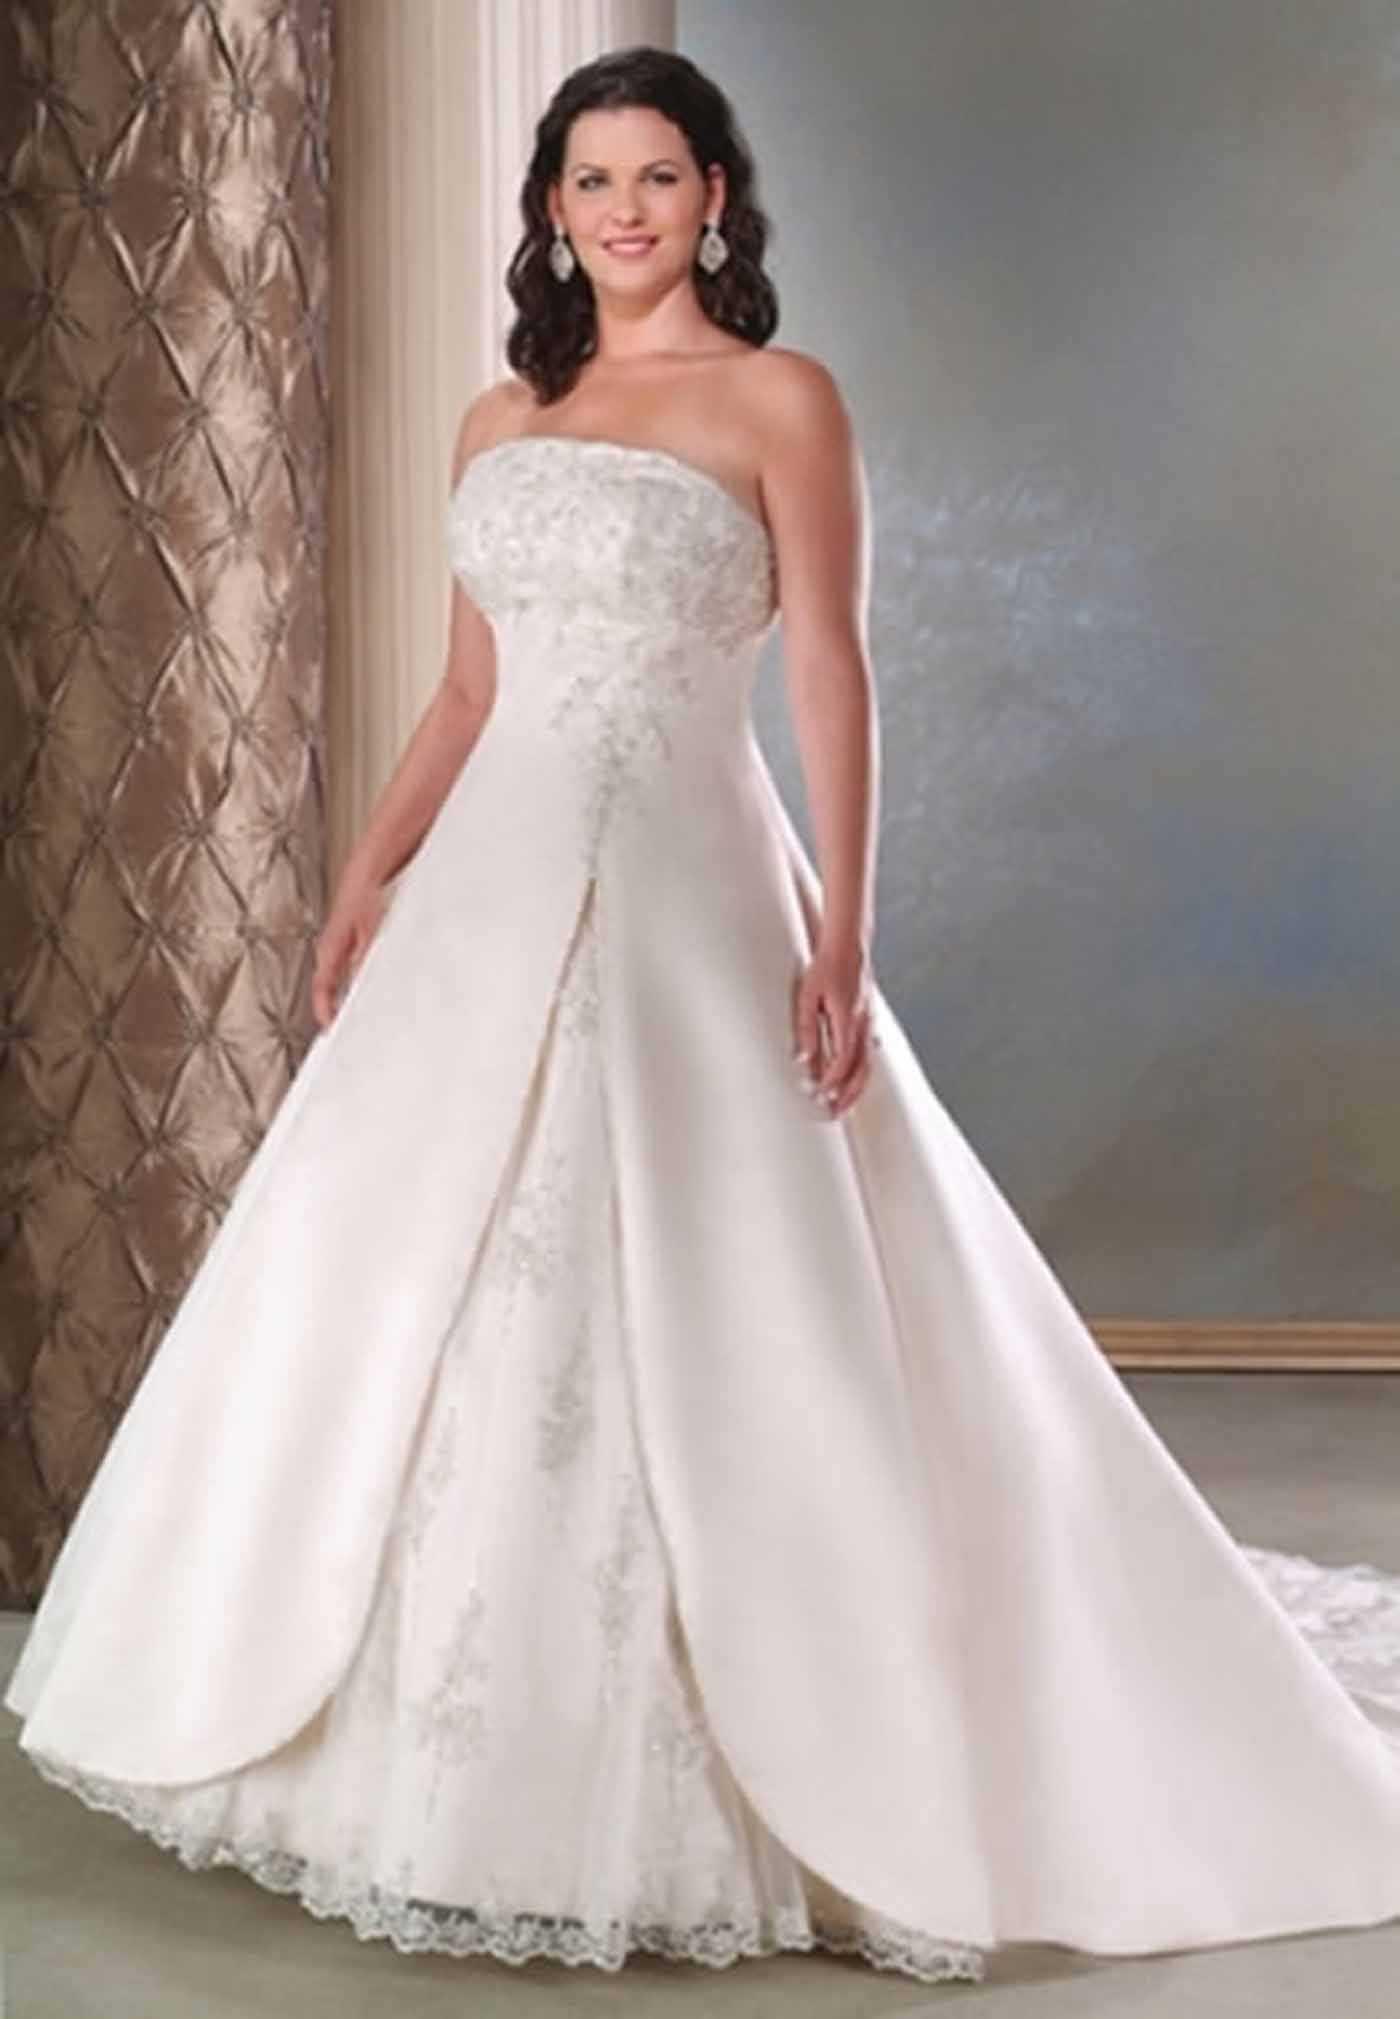 بالصور اجمل فساتين اعراس , احلى فساتين زفاف ناعمة 5683 9